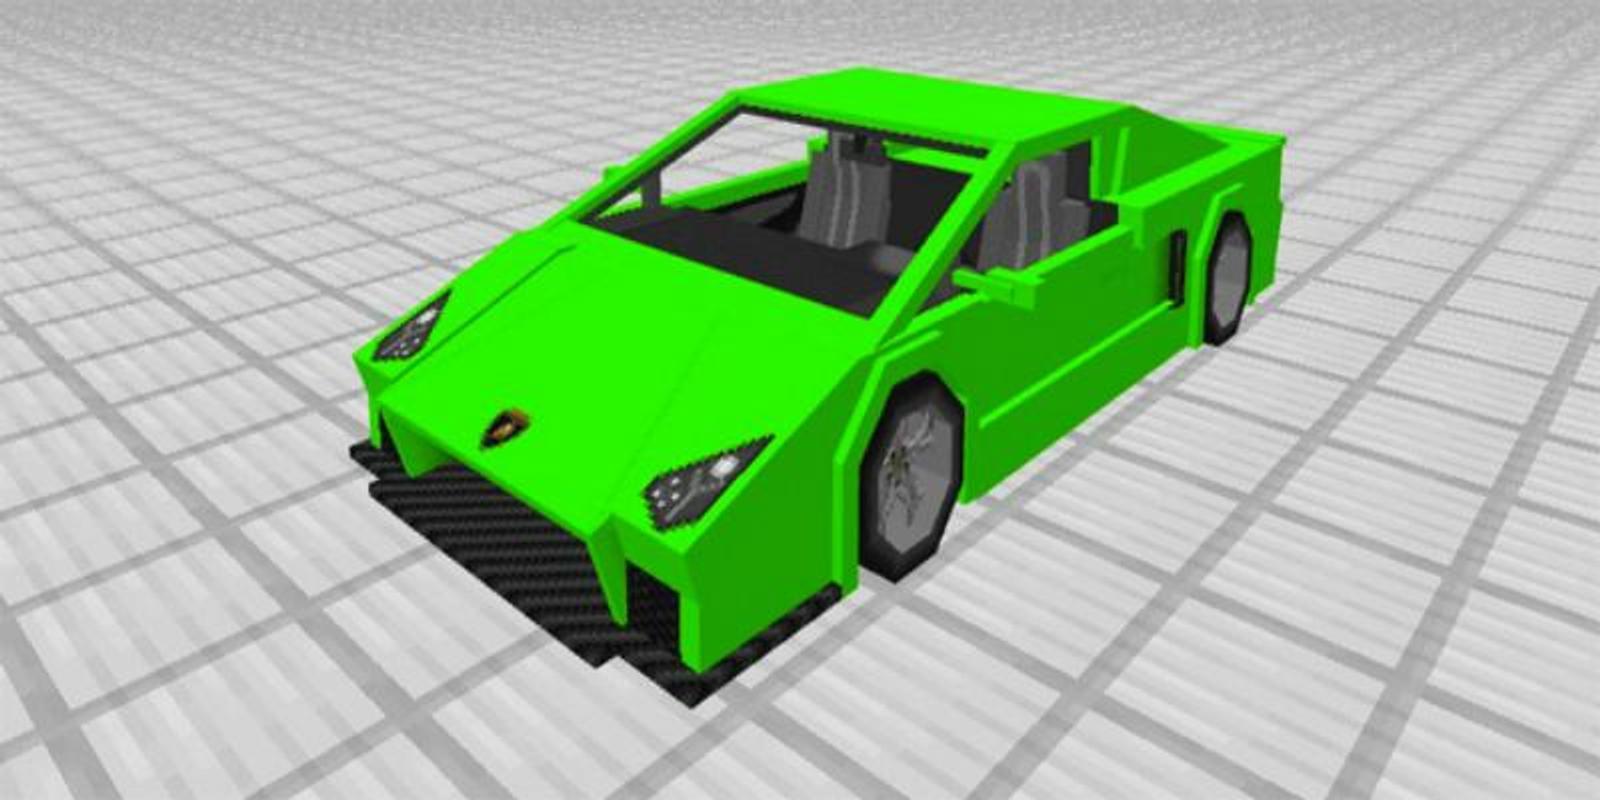 Sport Car Mod Lamborghini for Minecraft